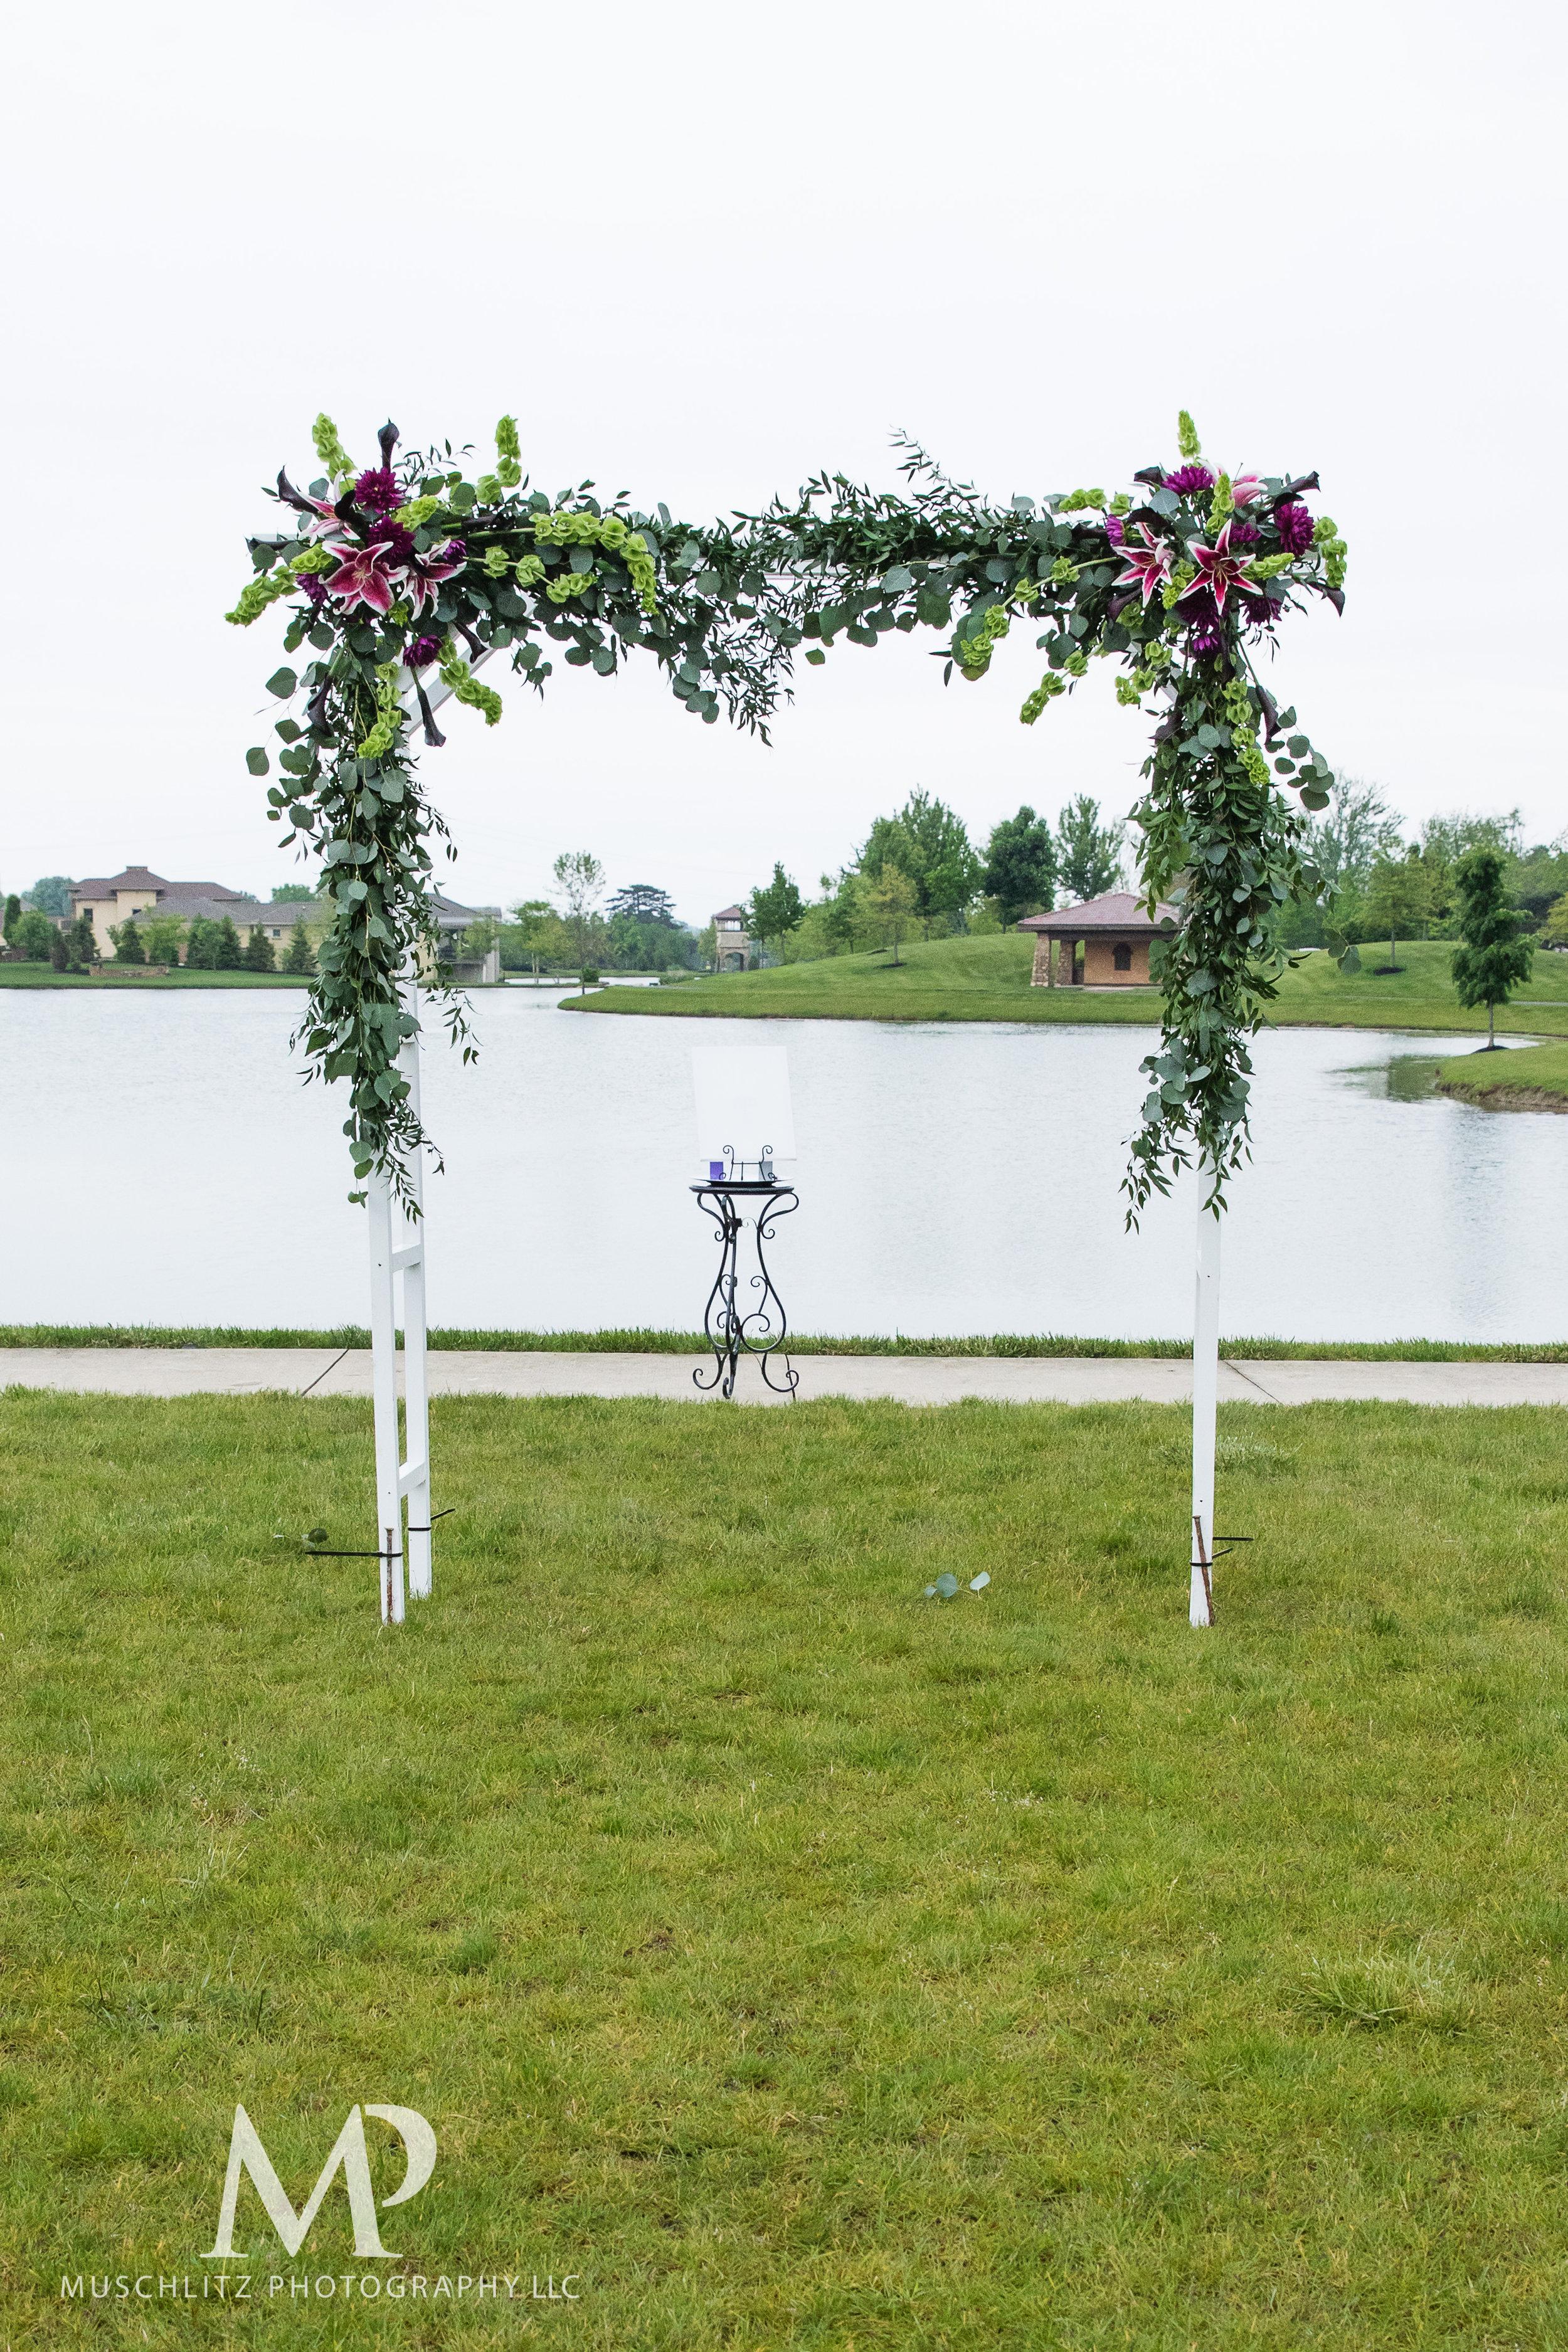 club-at-corazon-wedding-ceremony-reception-columbus-dublin-ohio-ohio-university-theme-021.JPG